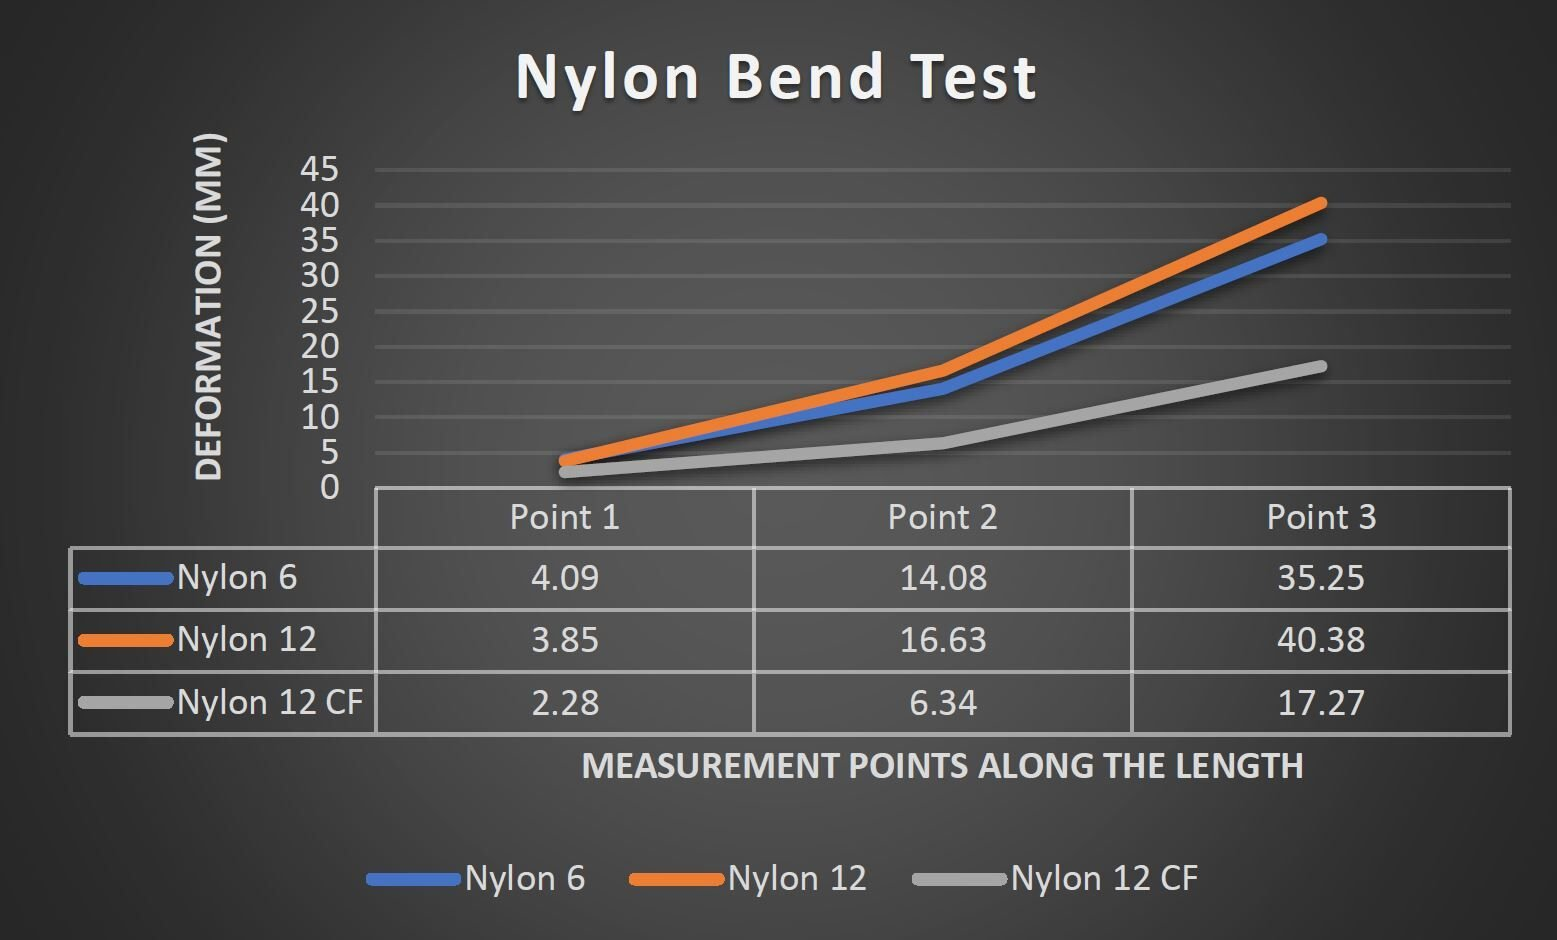 Nylon Bend Test